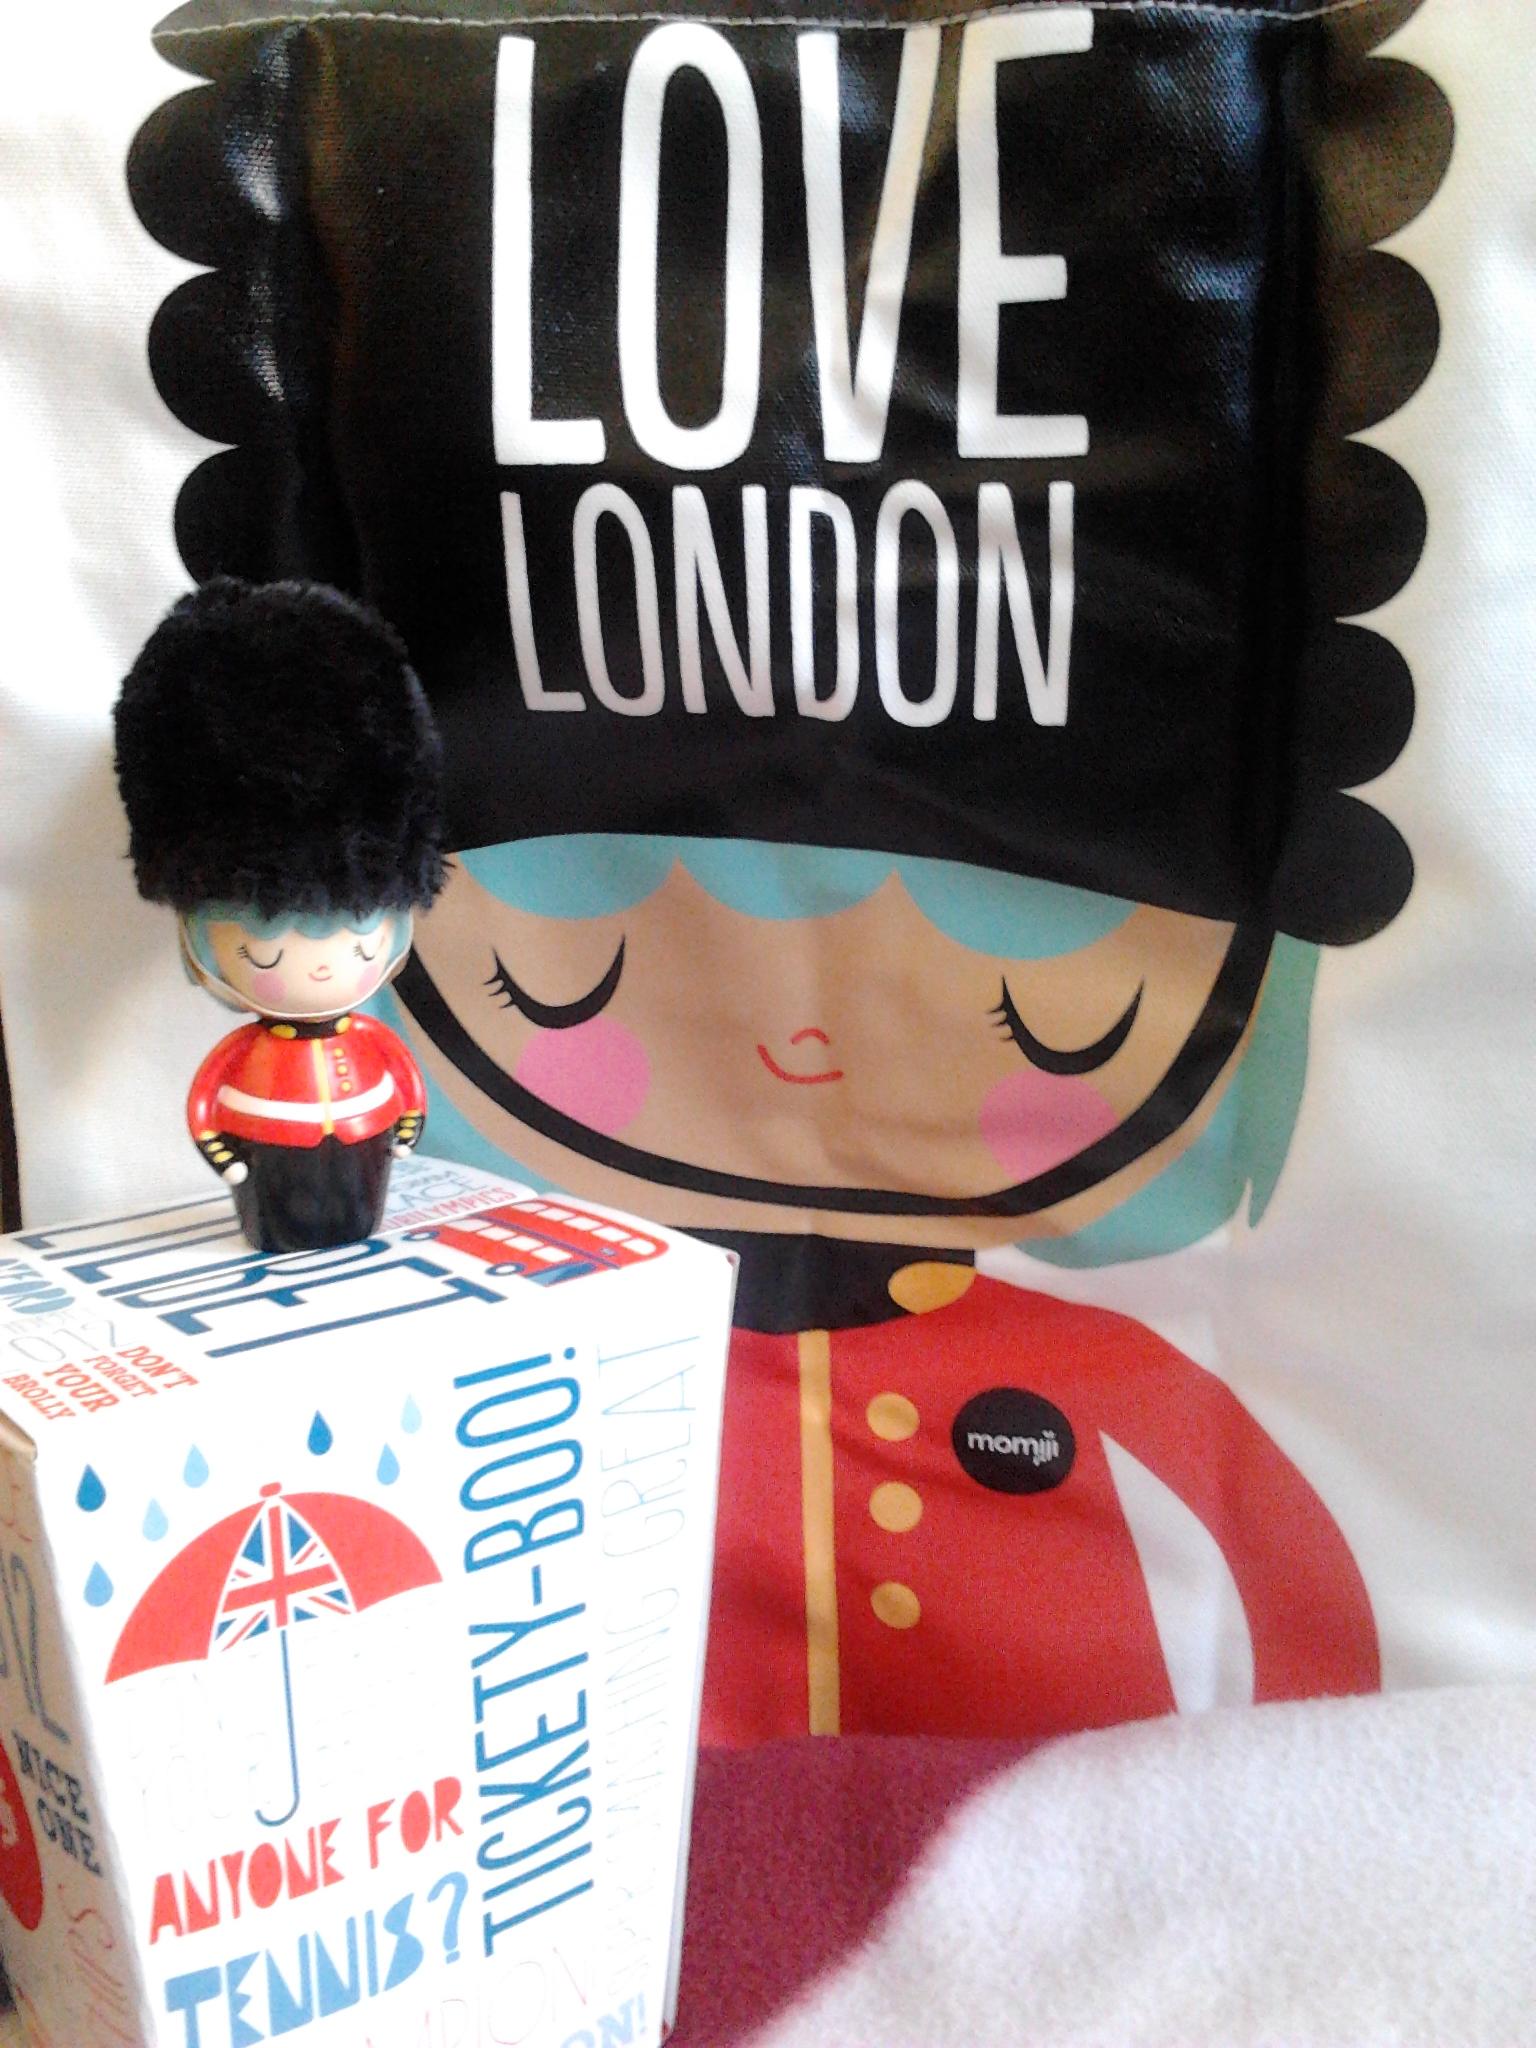 We love London